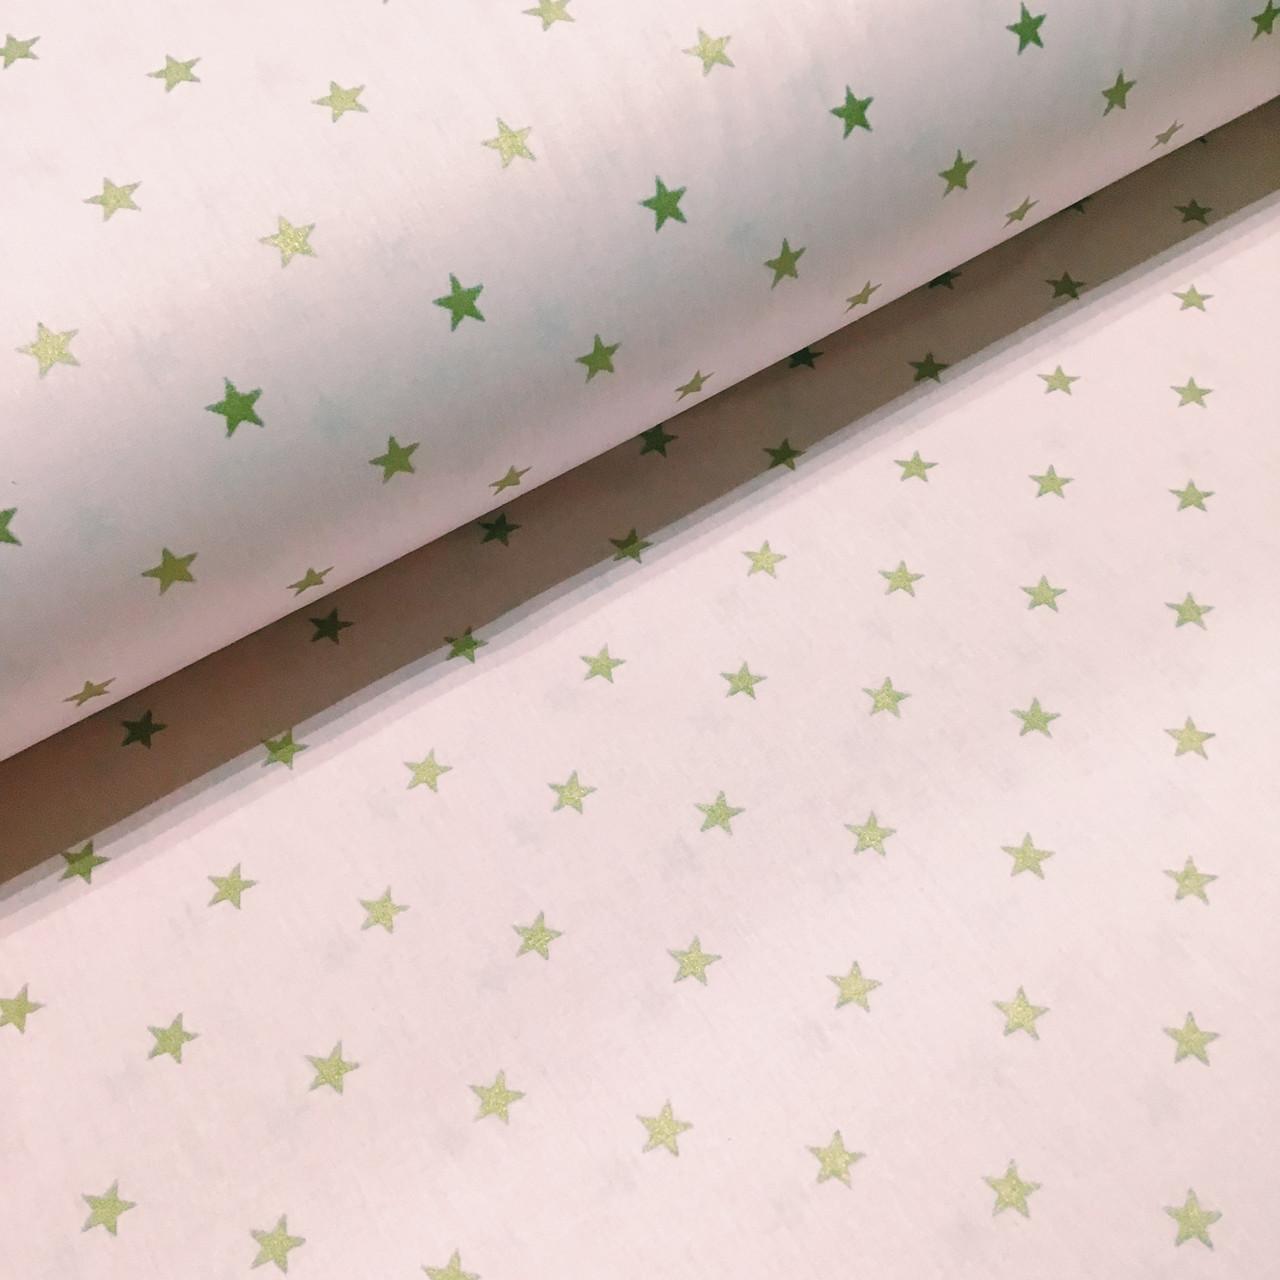 Ткань поплин звездочки золотые (глиттер) на розовом (ТУРЦИЯ шир. 2,4 м) №33-155